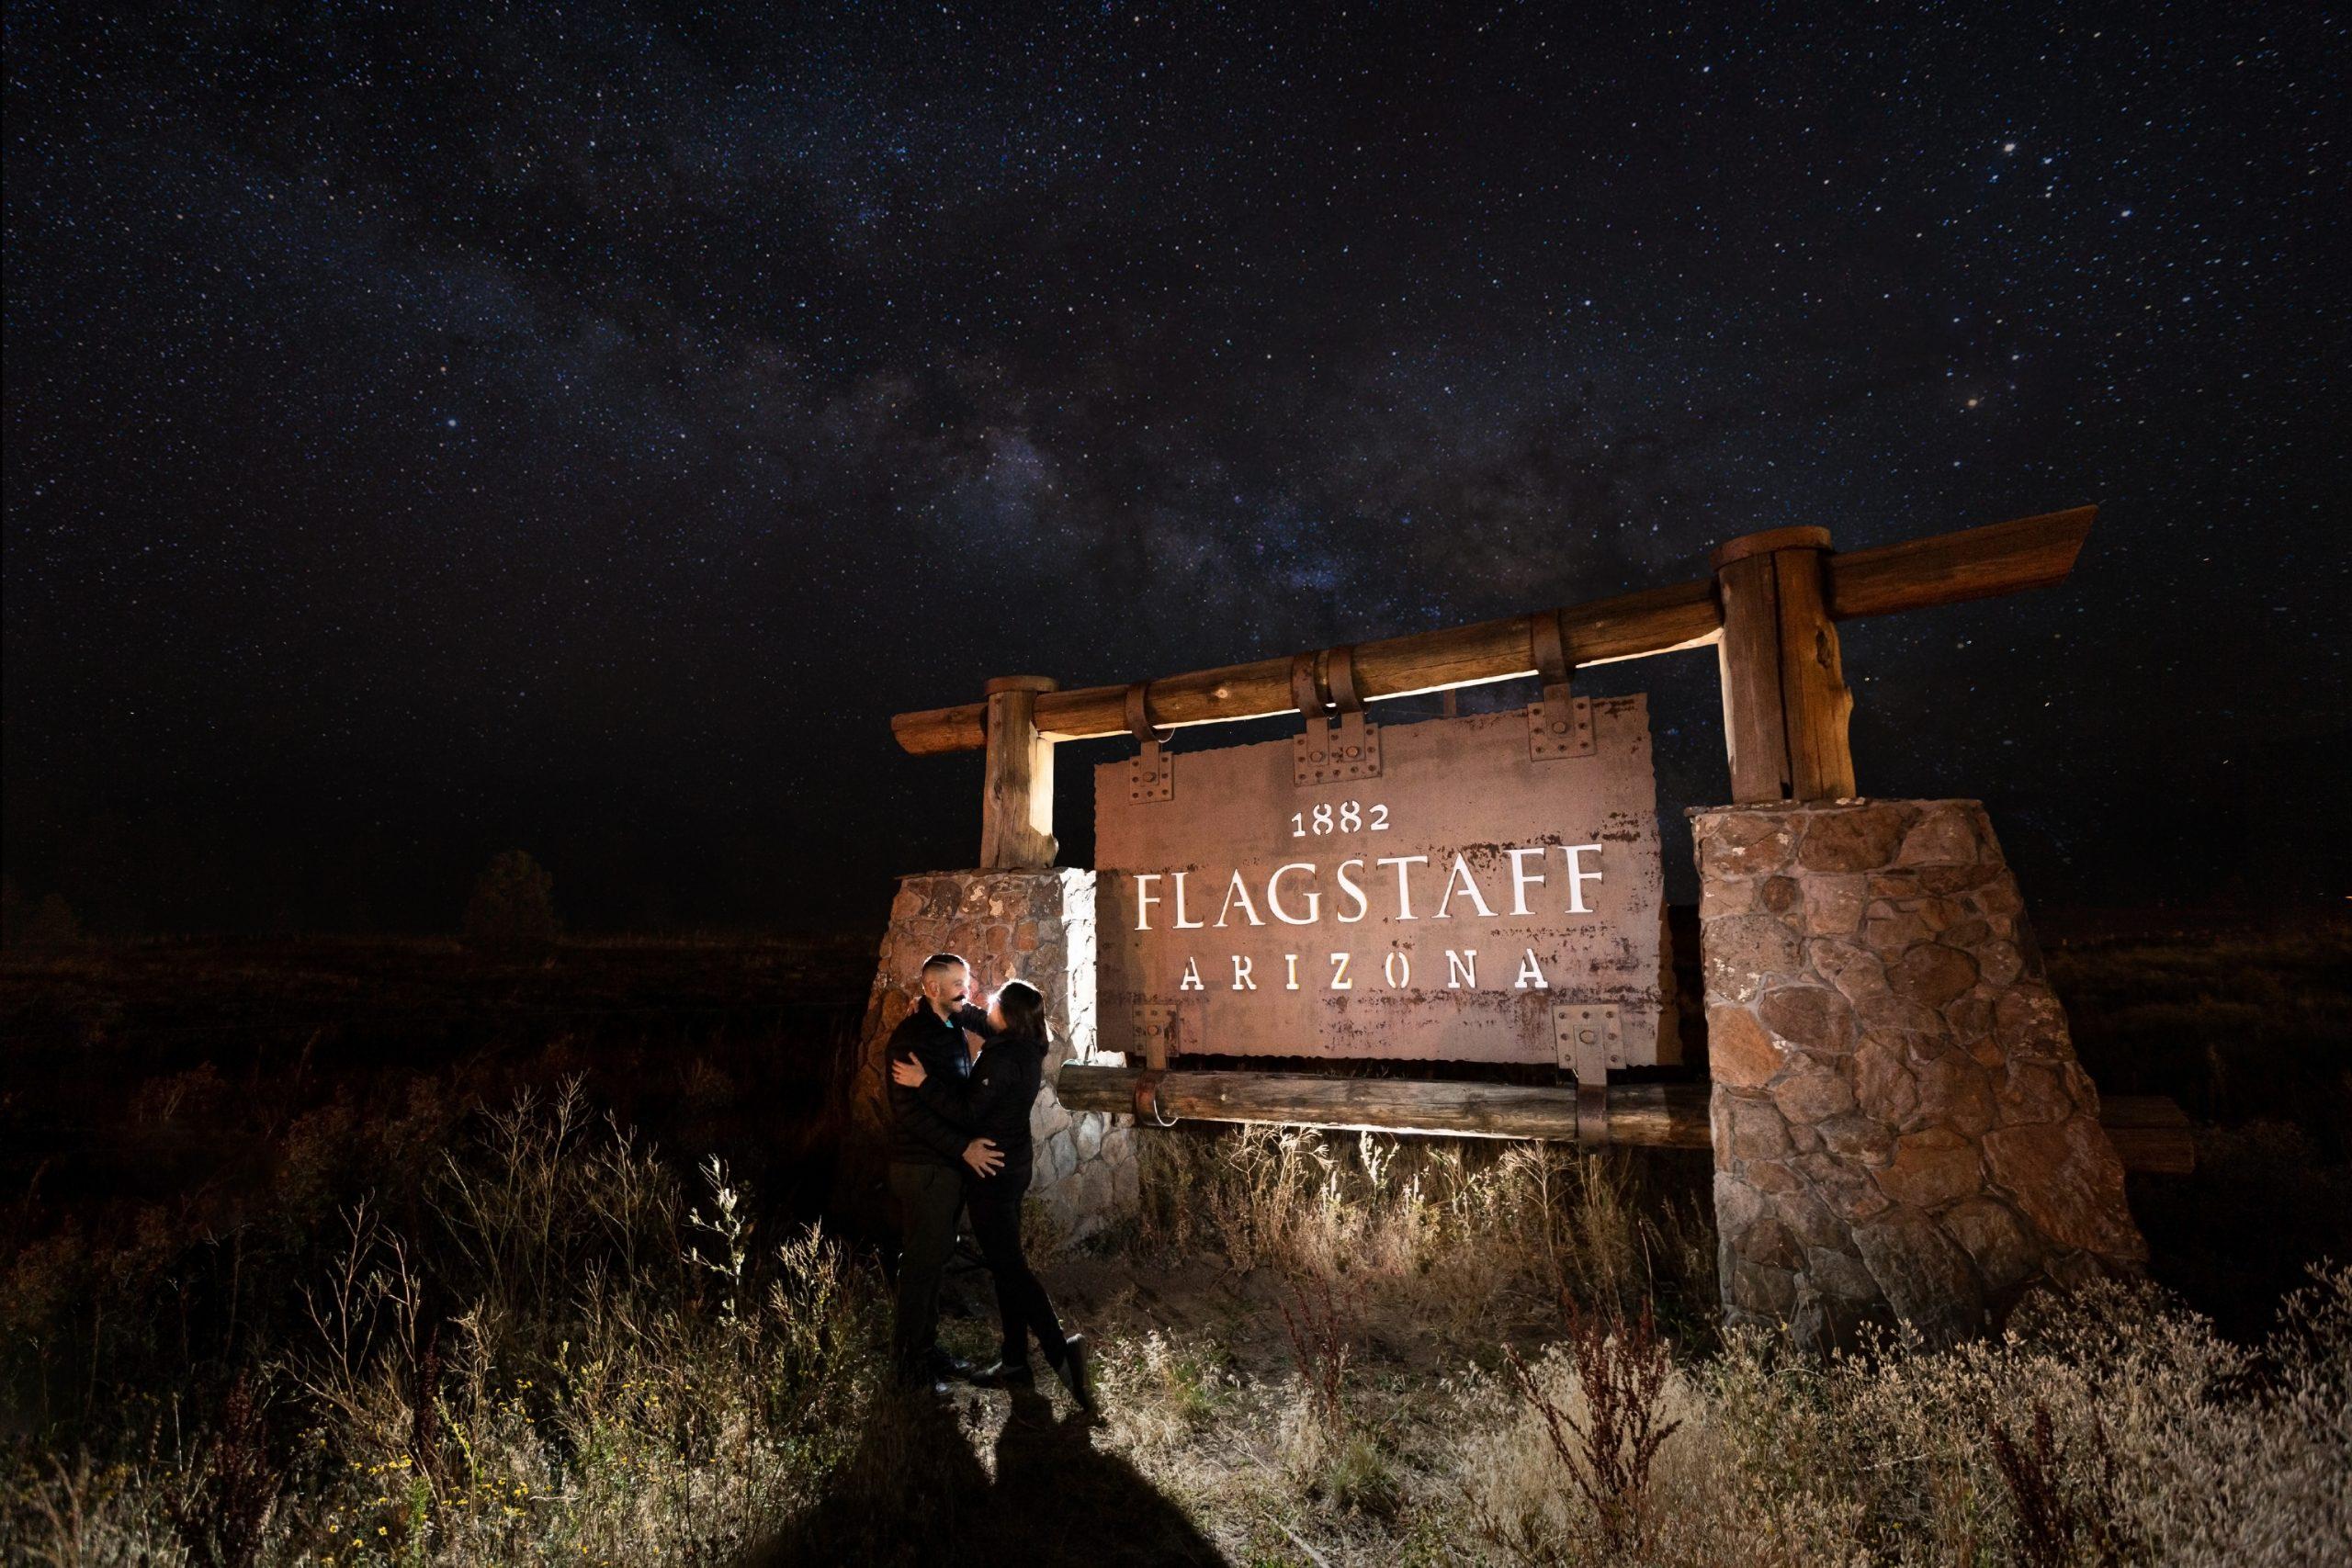 Flagstaff Arizona Top 5 Things to Do Dark Skies